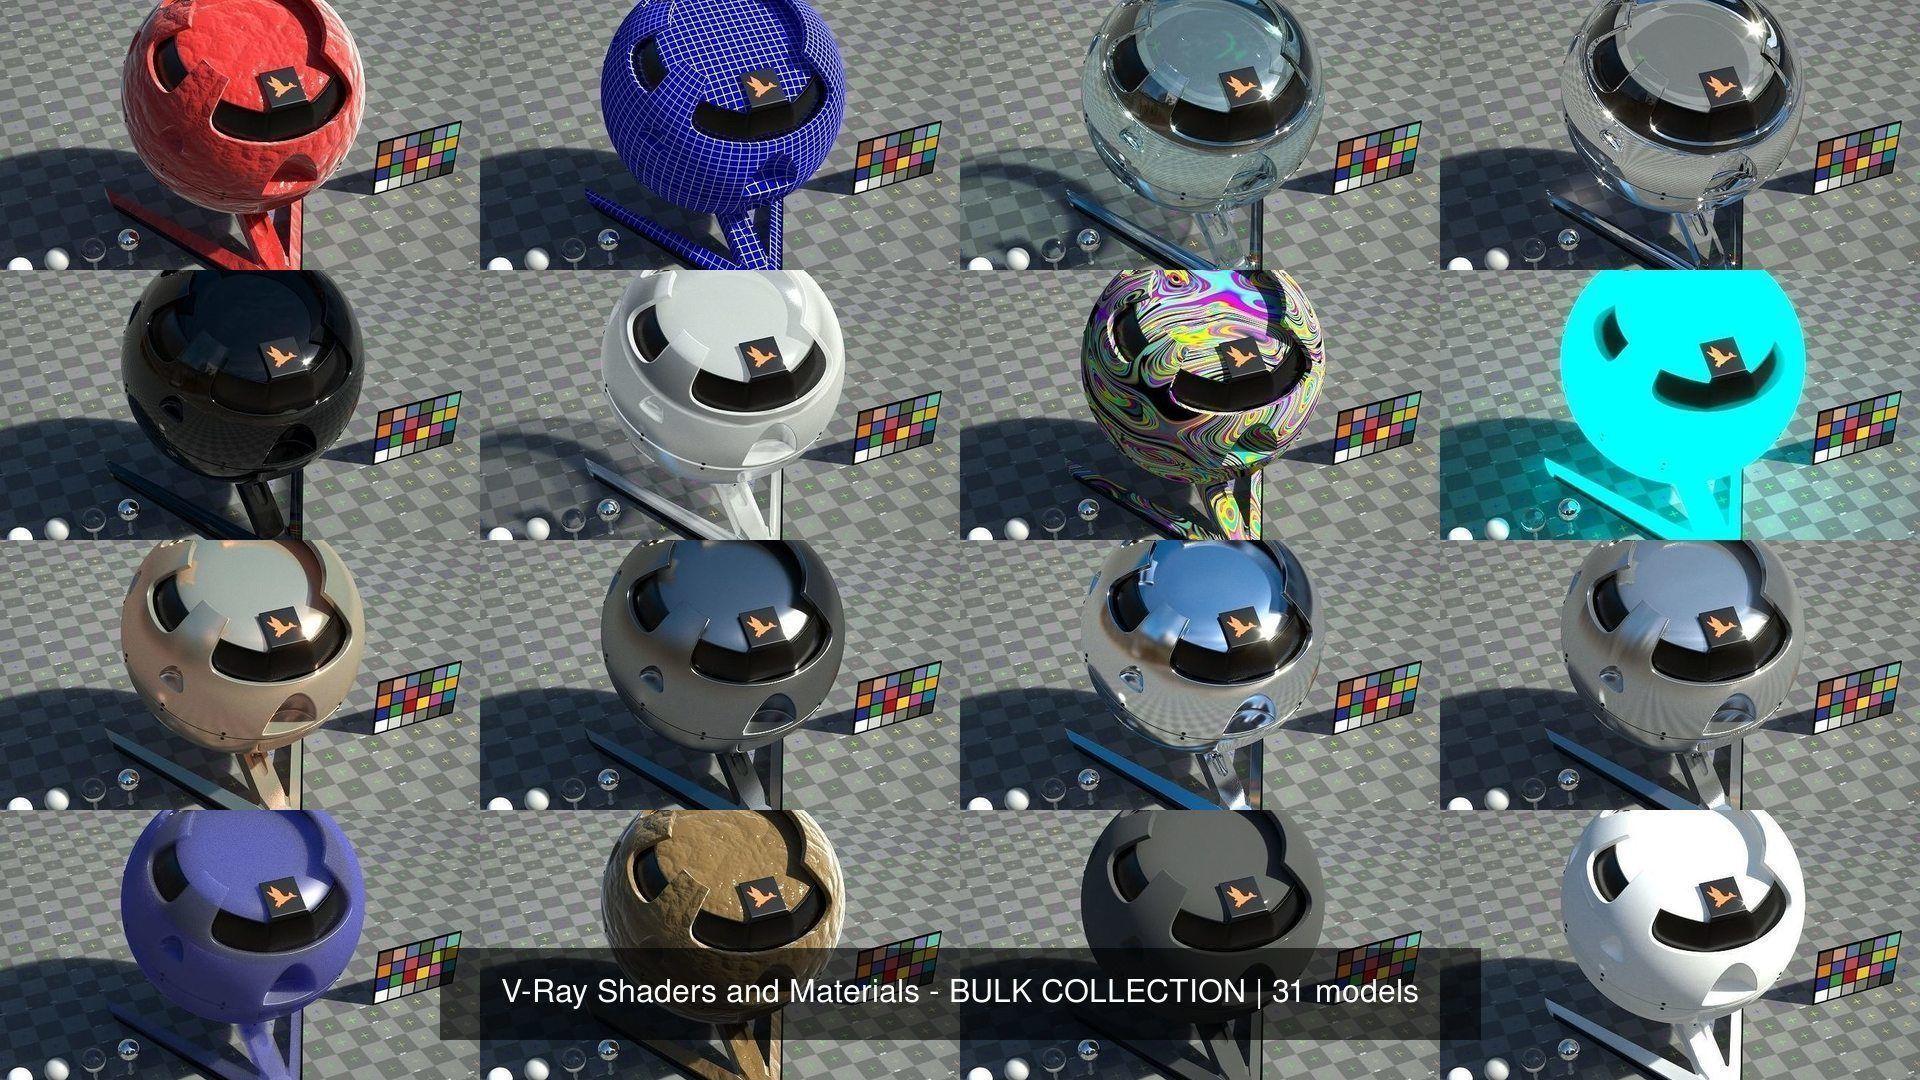 V-Ray Shaders and Materials - BULK COLLECTION - BIG DISCOUNT